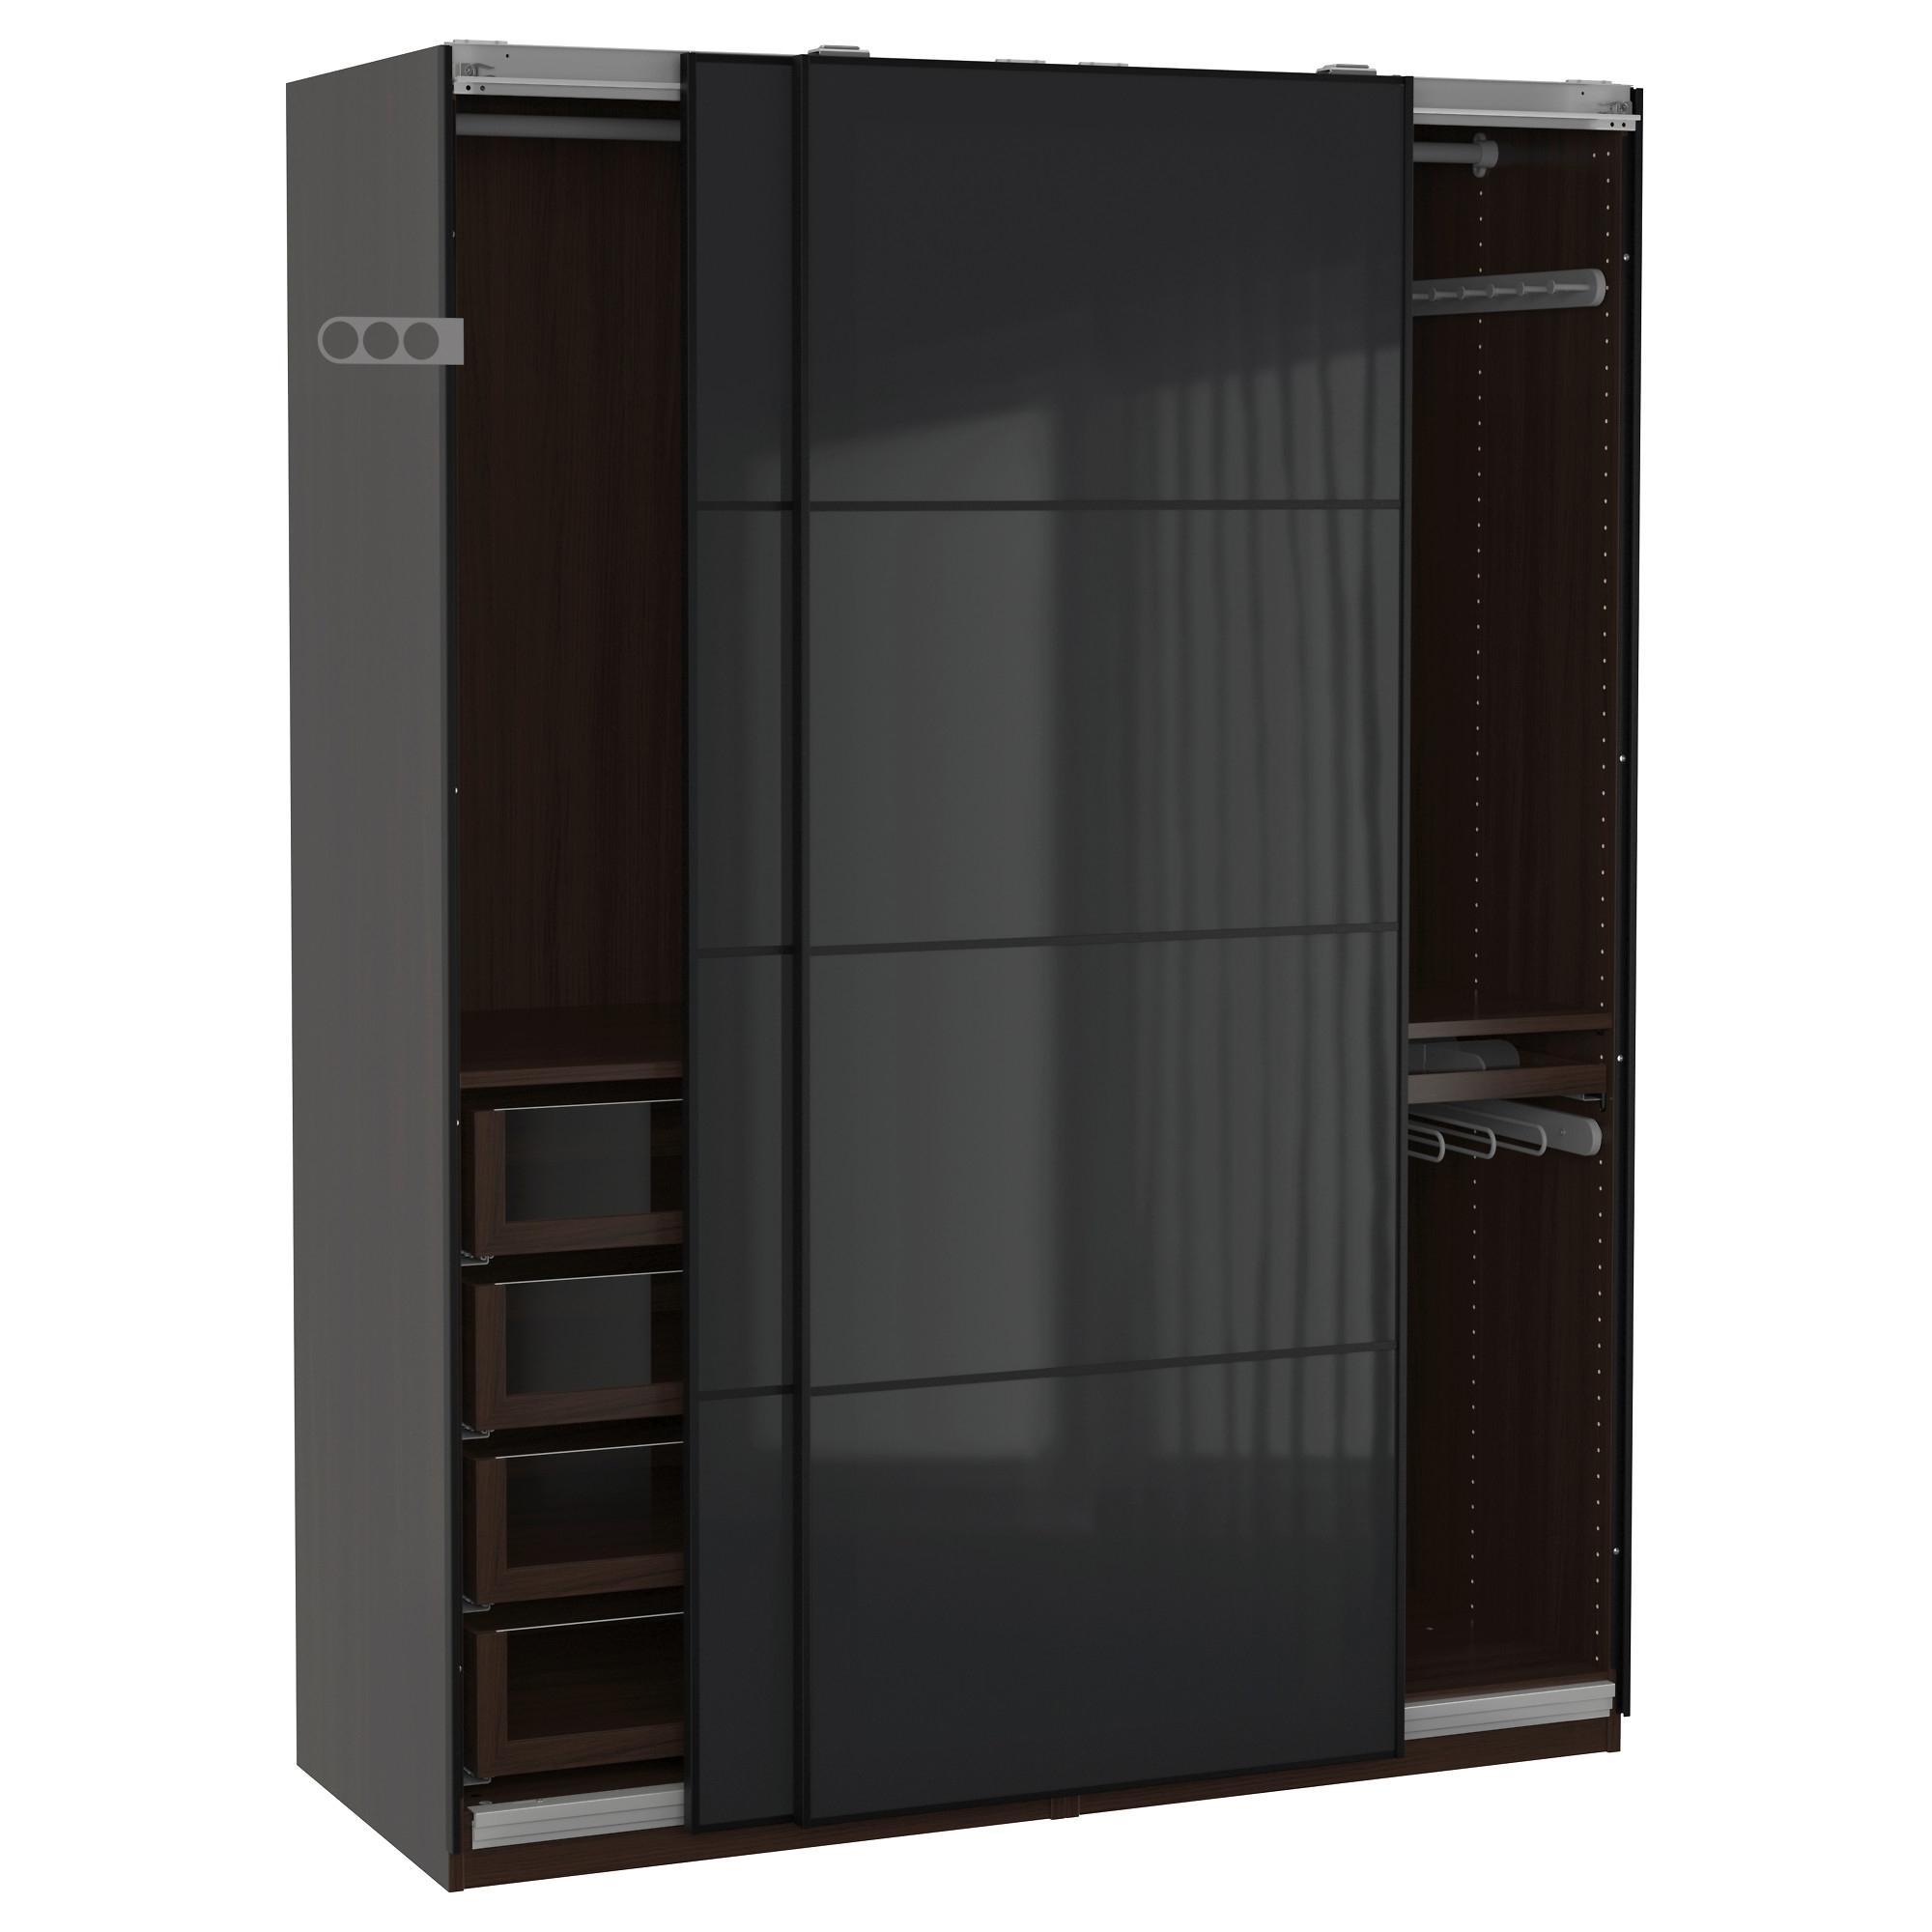 Black Glass Wardrobes With Regard To 2017 Pax Wardrobe Black Brown/uggdal Grey Glass 150X66X201 Cm – Ikea (View 3 of 15)